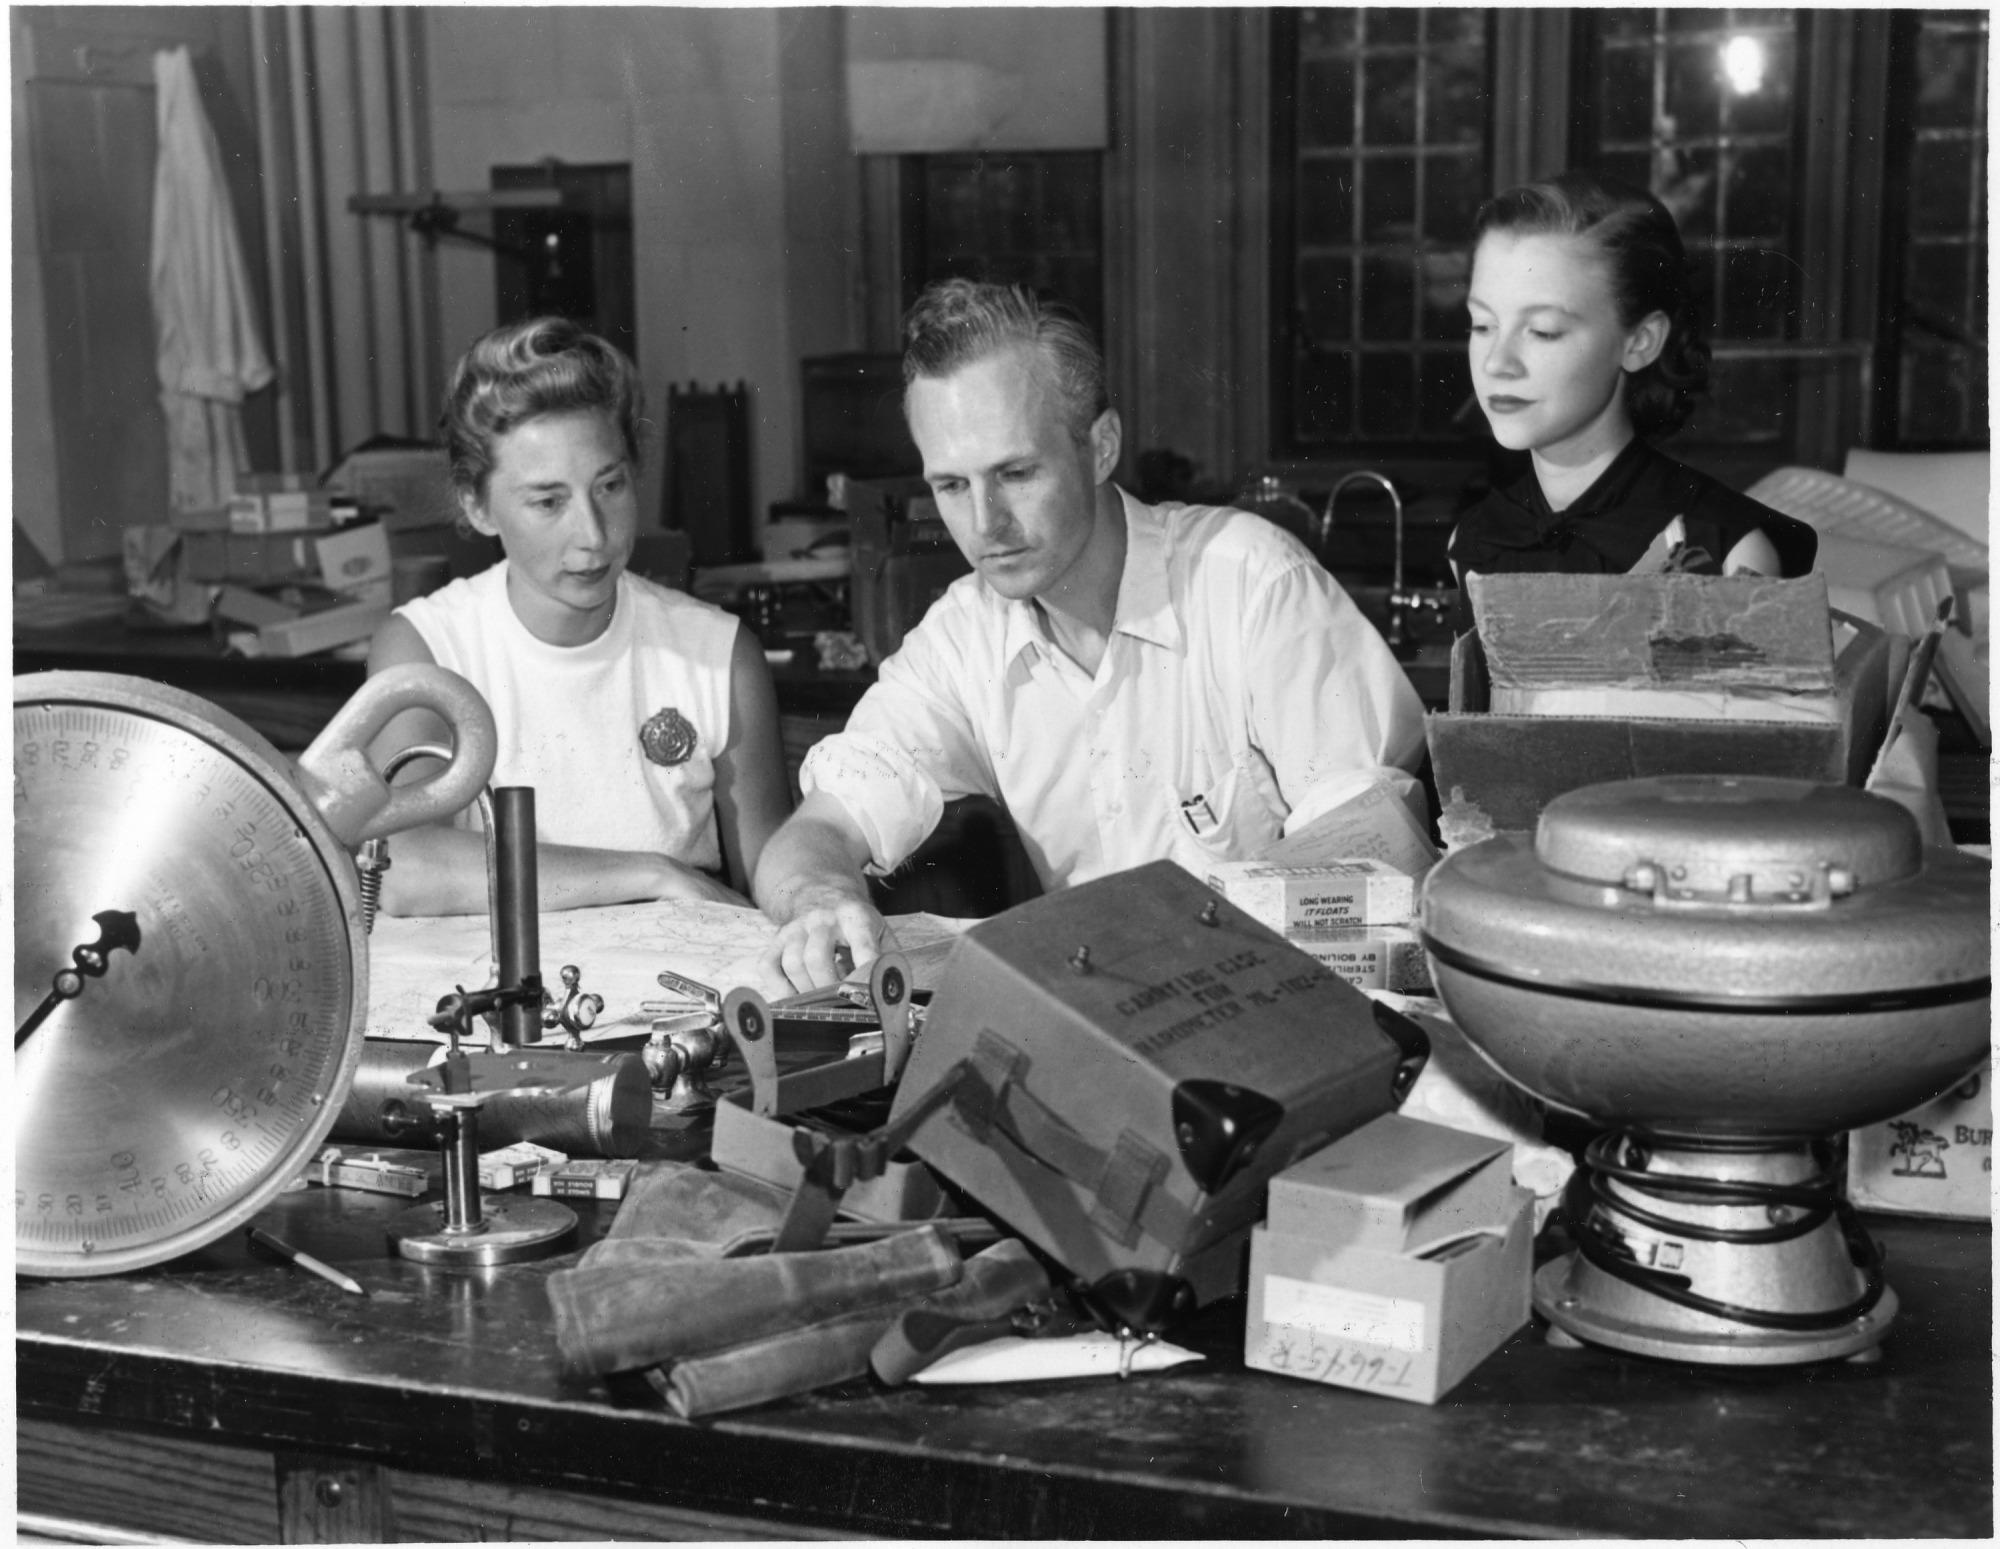 left to right: Bodil Mimi Krogh Schmidt-Nielsen (b. 1918), Knut Schmidt-Nielsen (1915-2007), and Barbara Wagner